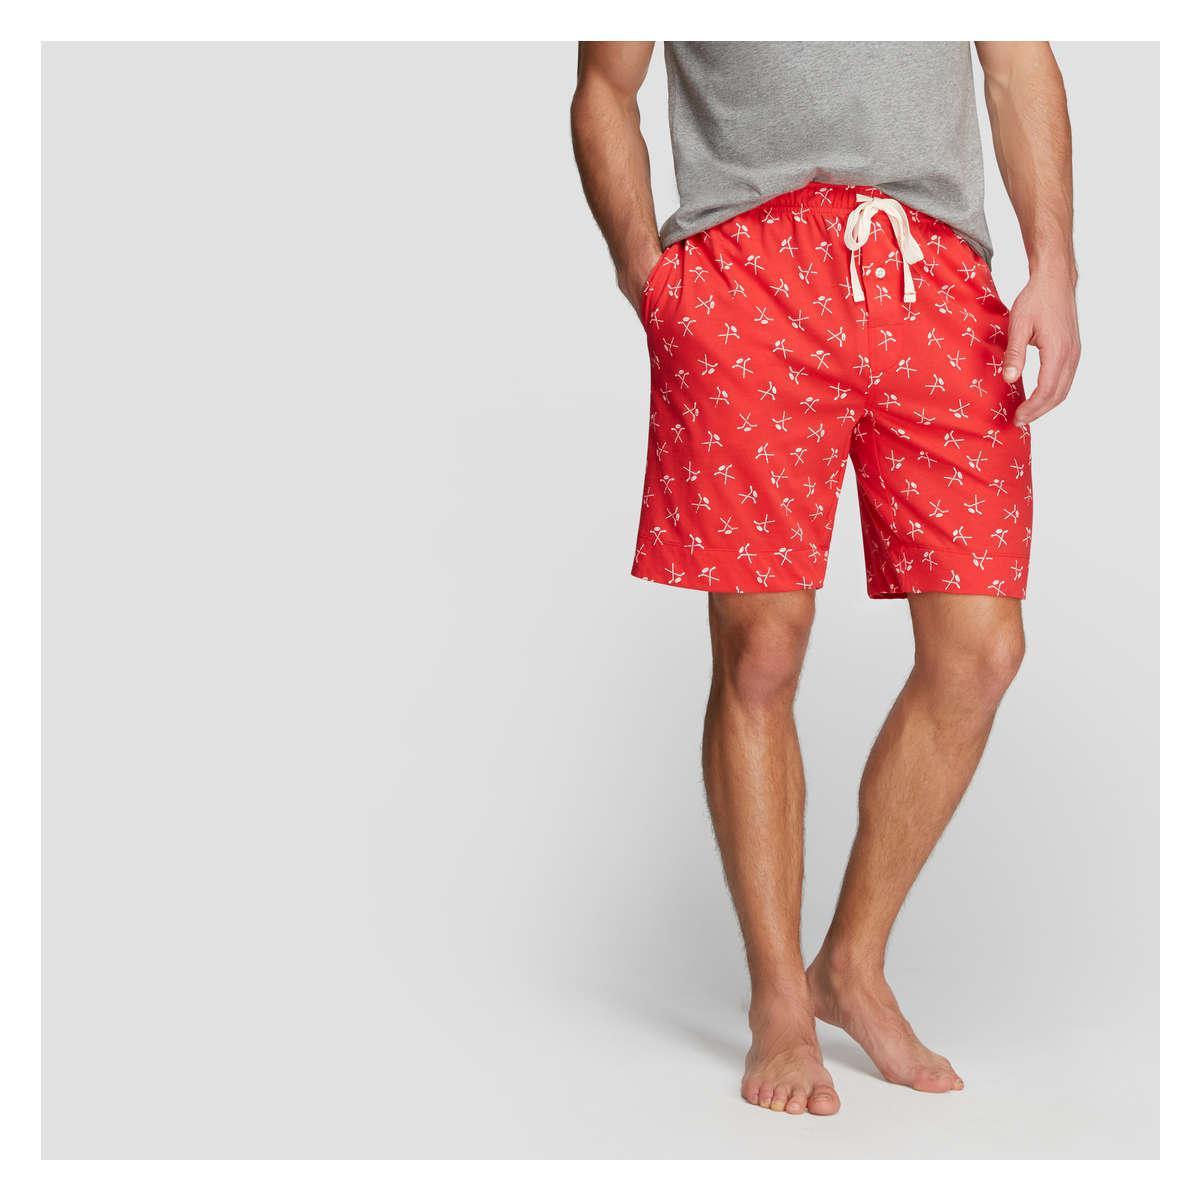 29a3903d1e6 Joe Fresh Men's Knit Sleep Short in Red for Men - Lyst